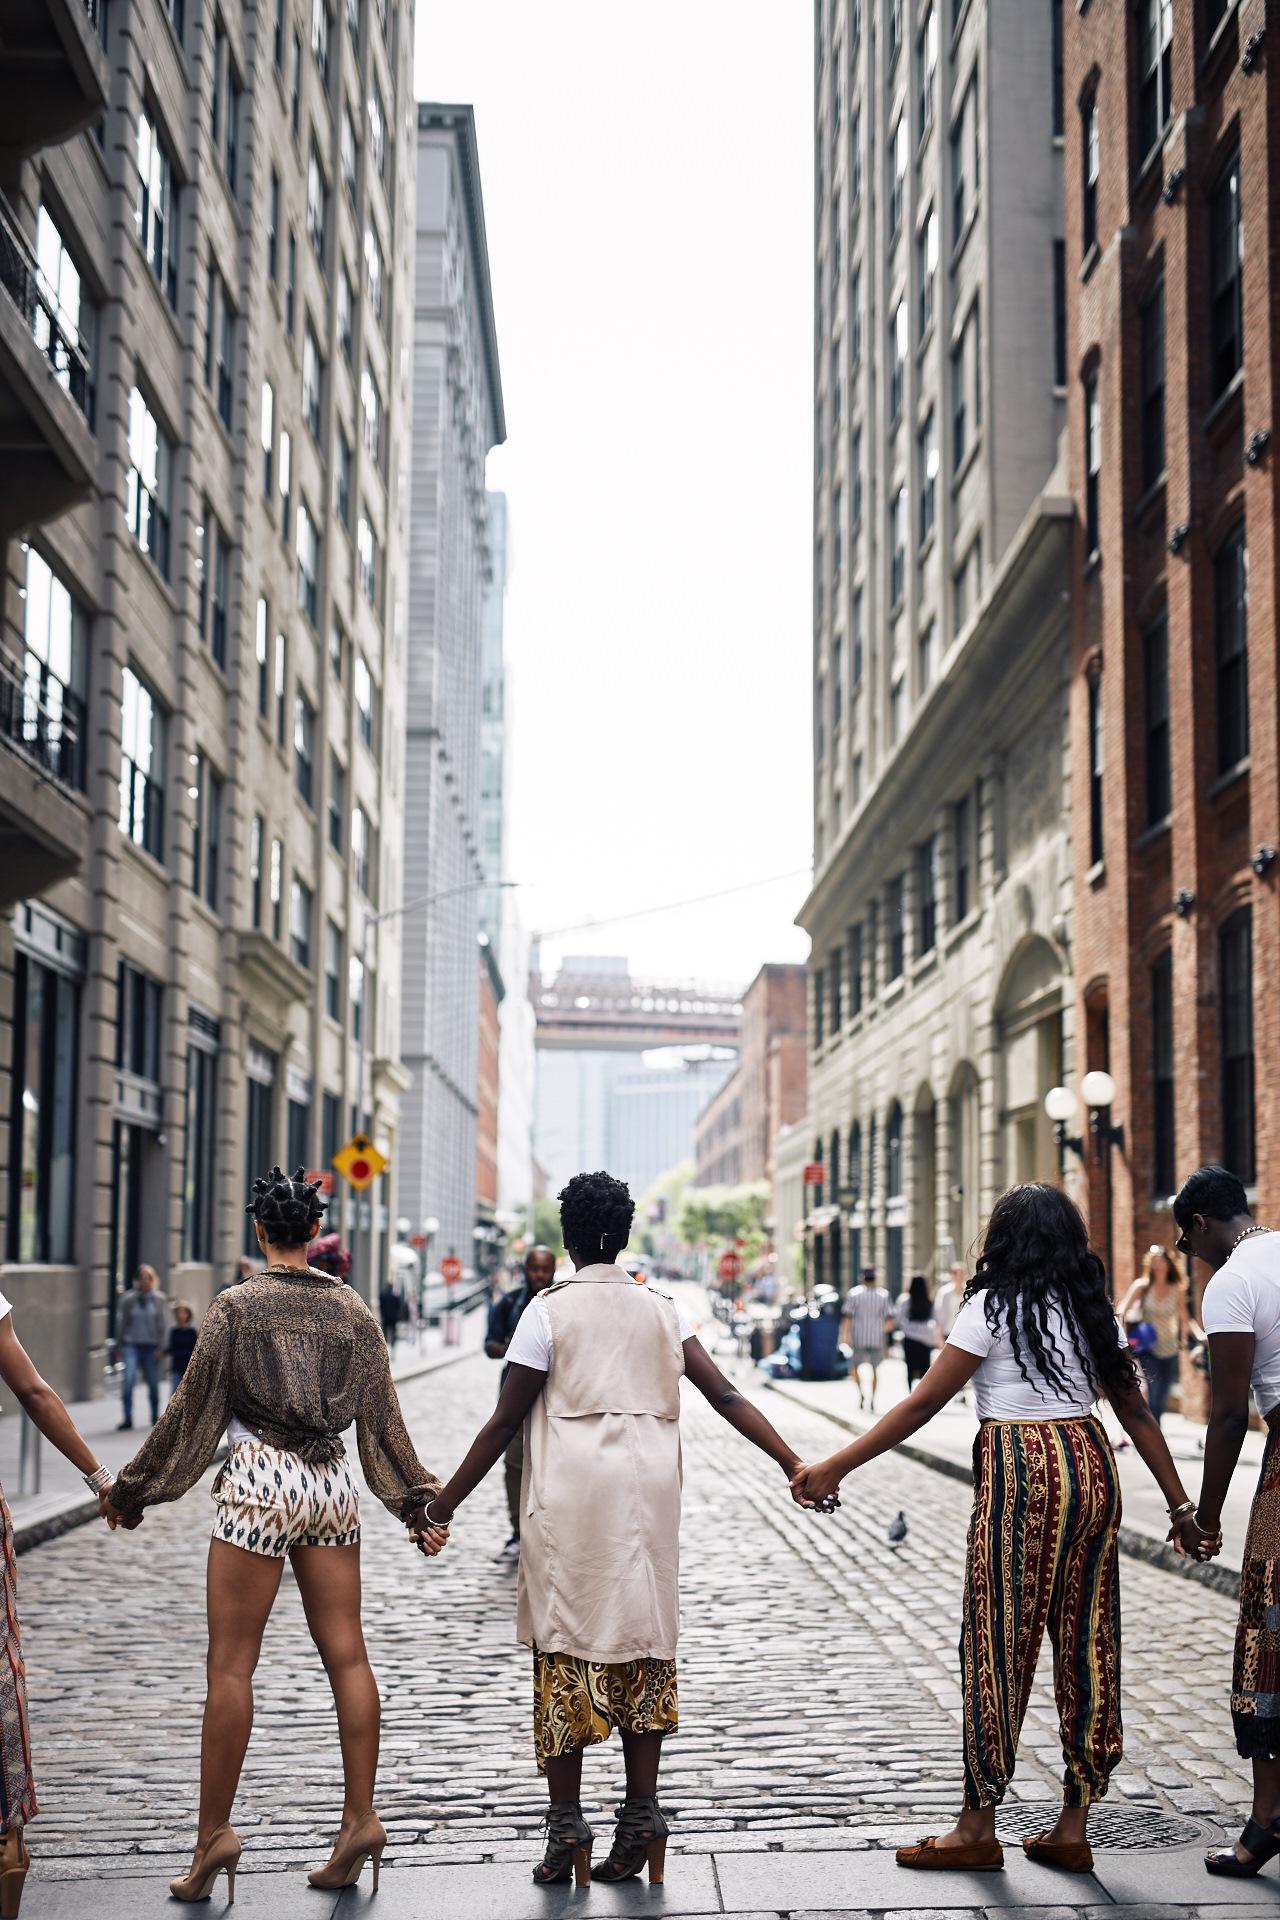 synergy among black women